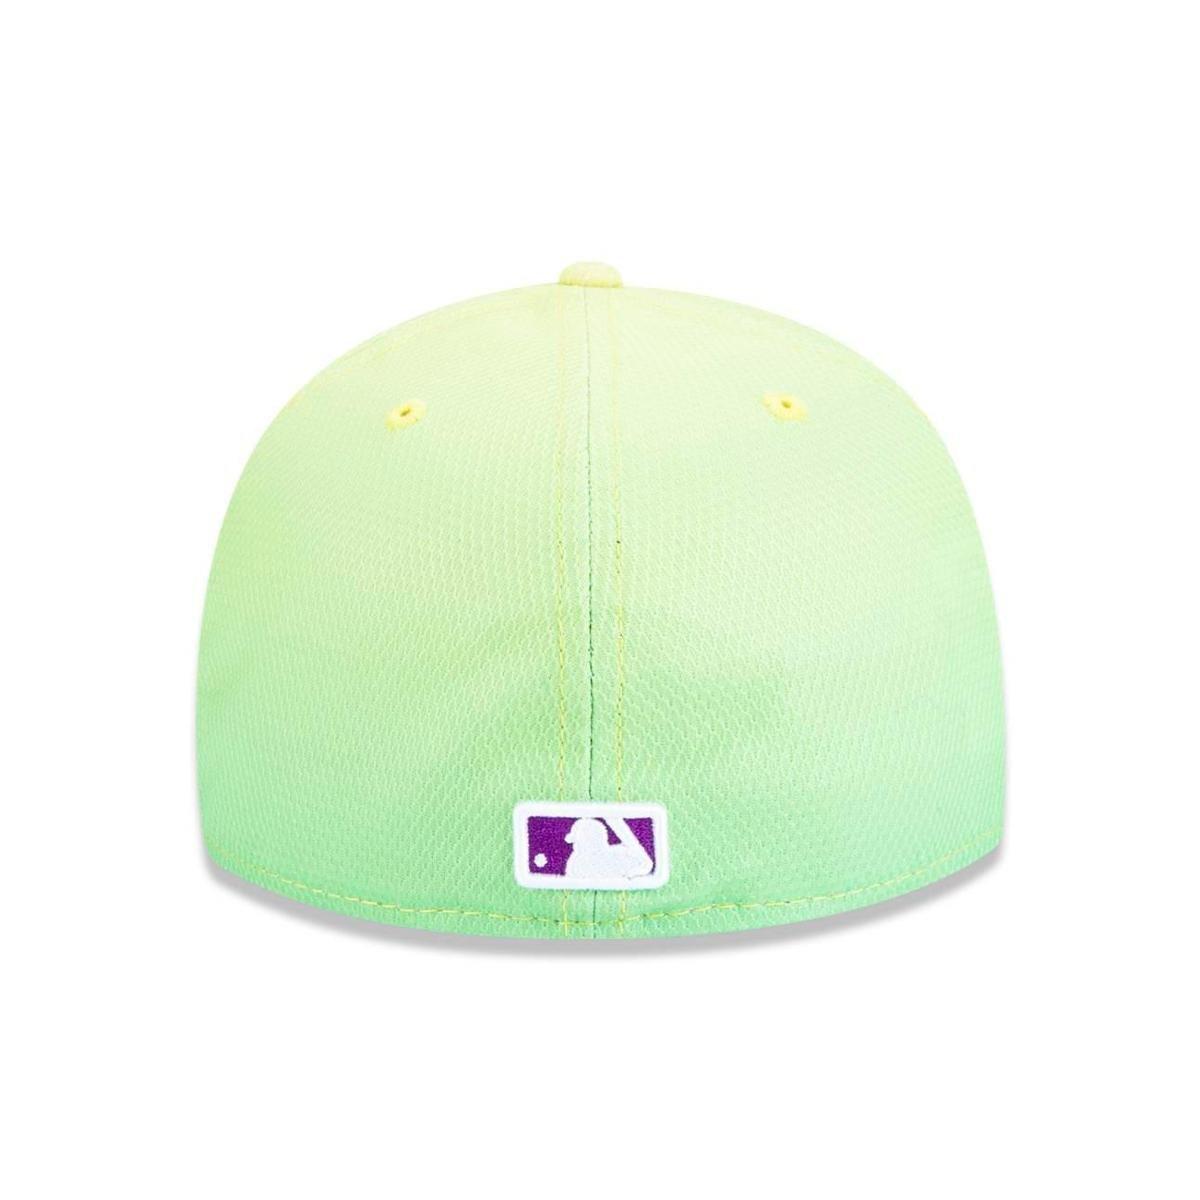 Boné 5950 San Francisco Giants MLB Aba Reta New Era - Compre Agora ... 2af308b0cc2